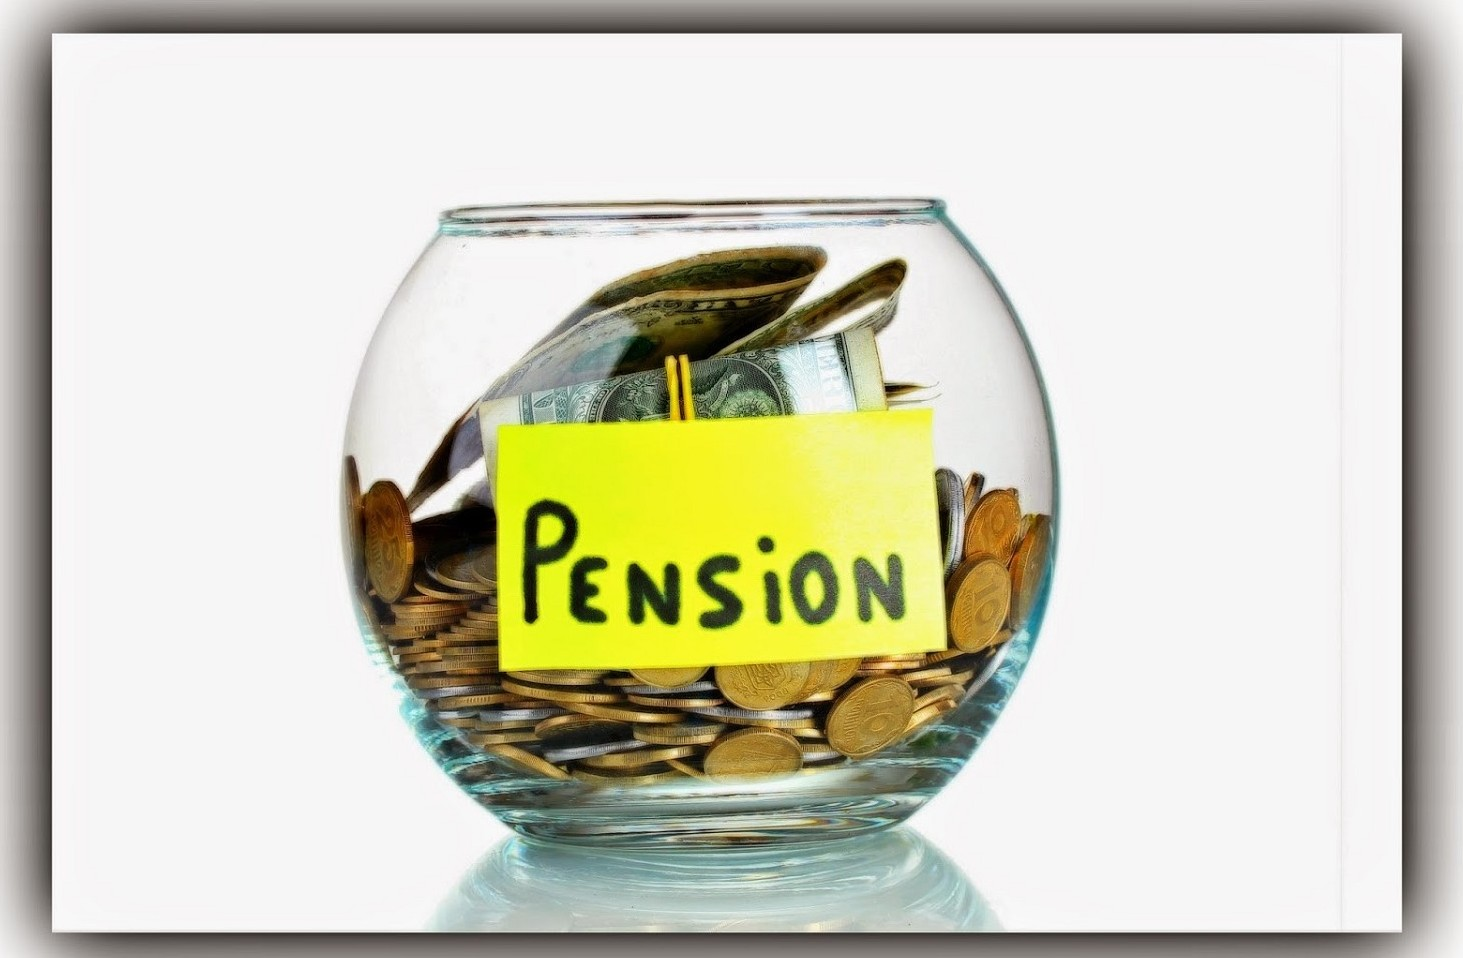 Pensioni, novit� le prossime riunioni uf